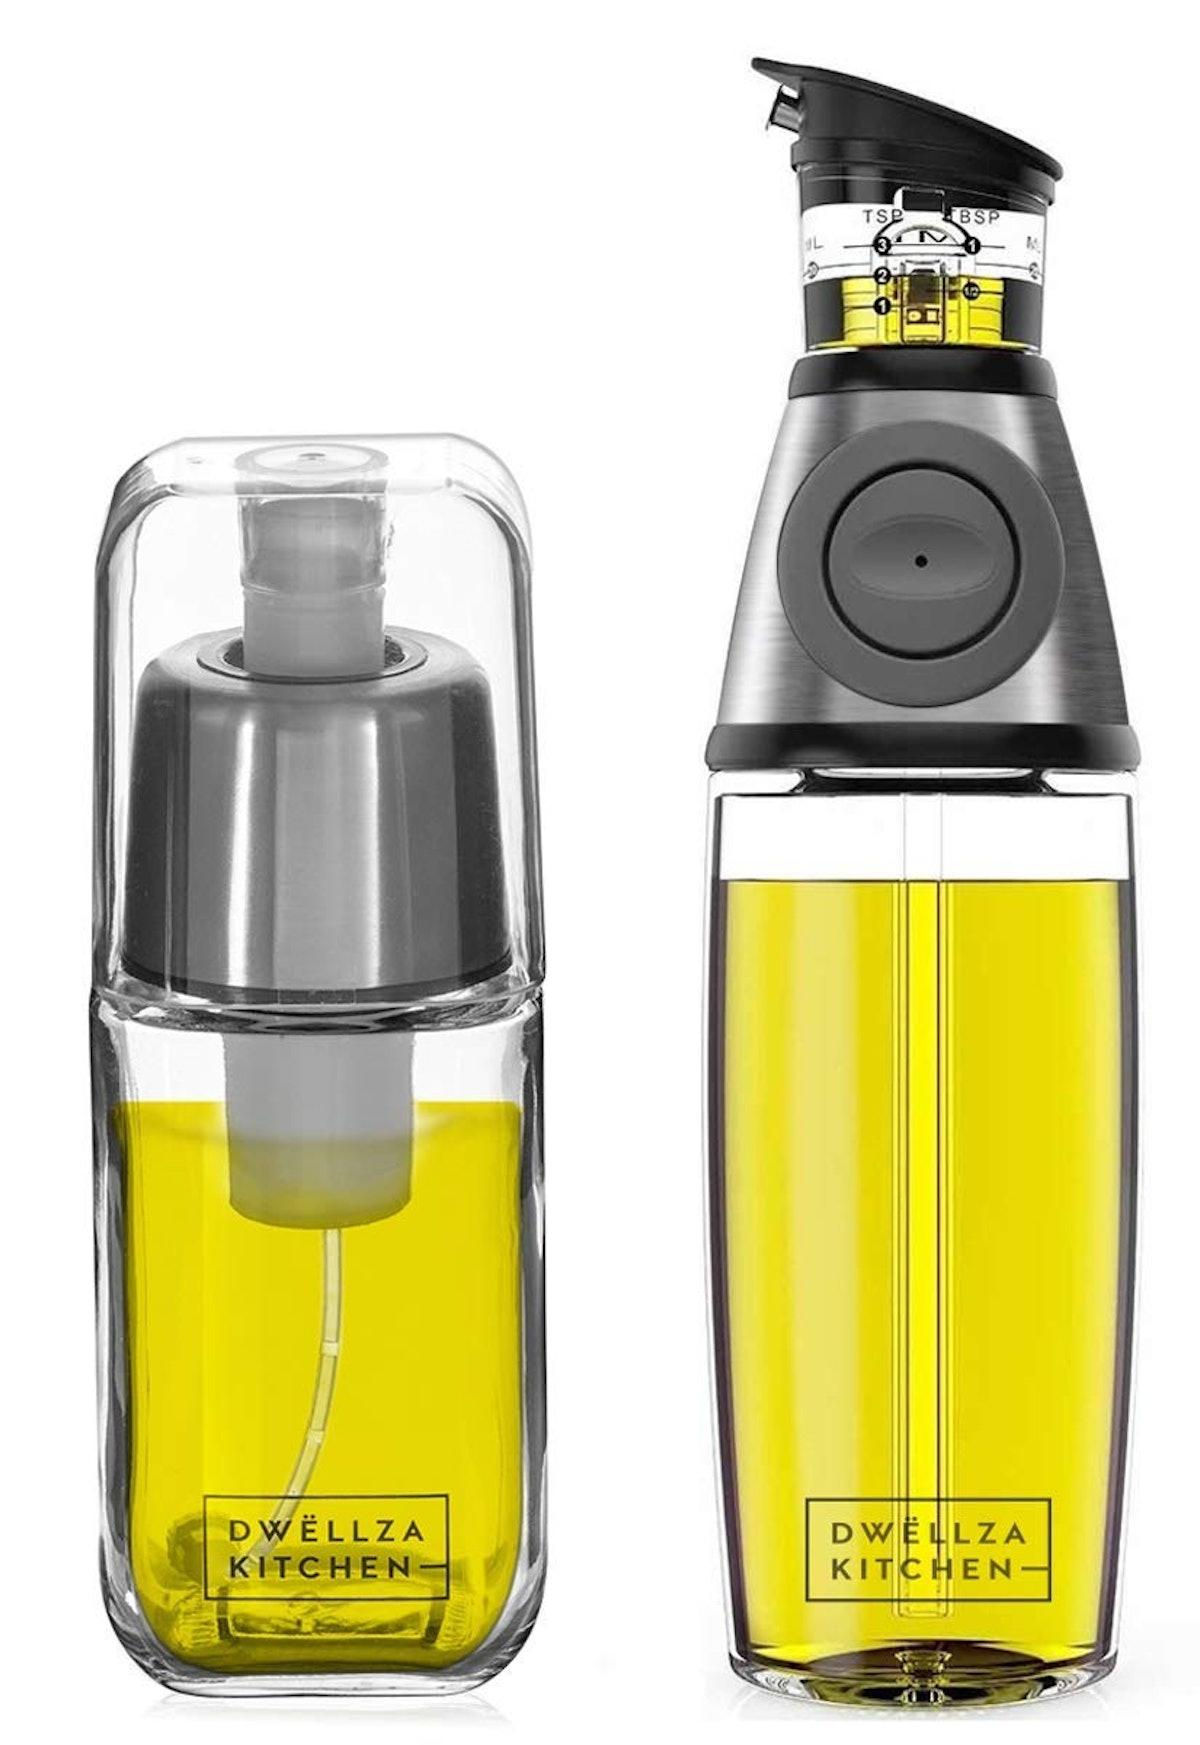 DWËLLZA KITCHEN Olive Oil Dispenser And Sprayer